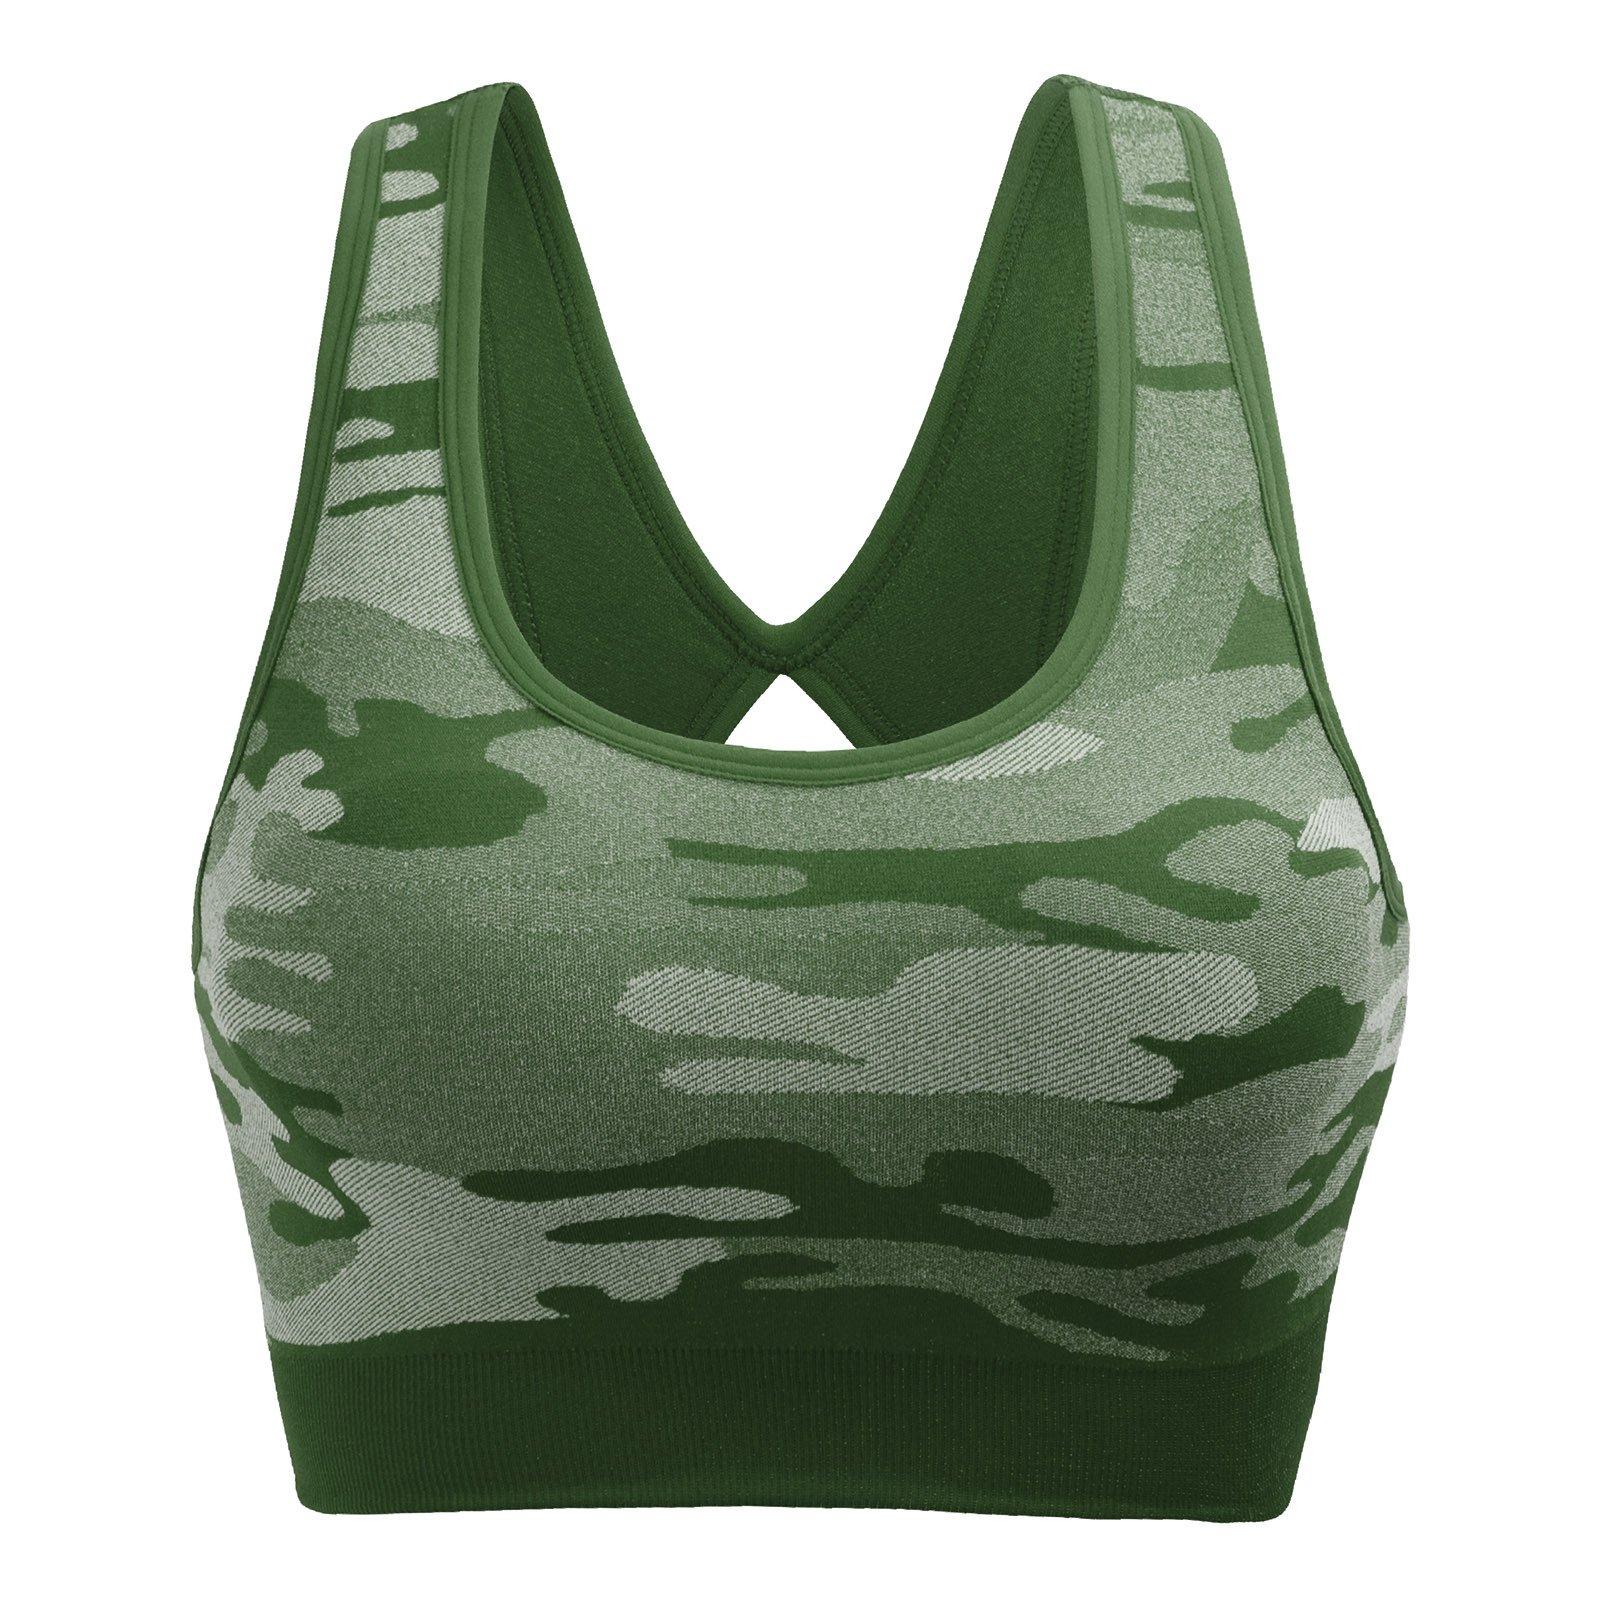 Mirity Women Racerback Sports Bras - High Impact Workout Gym Activewear Bra Color Army Size M